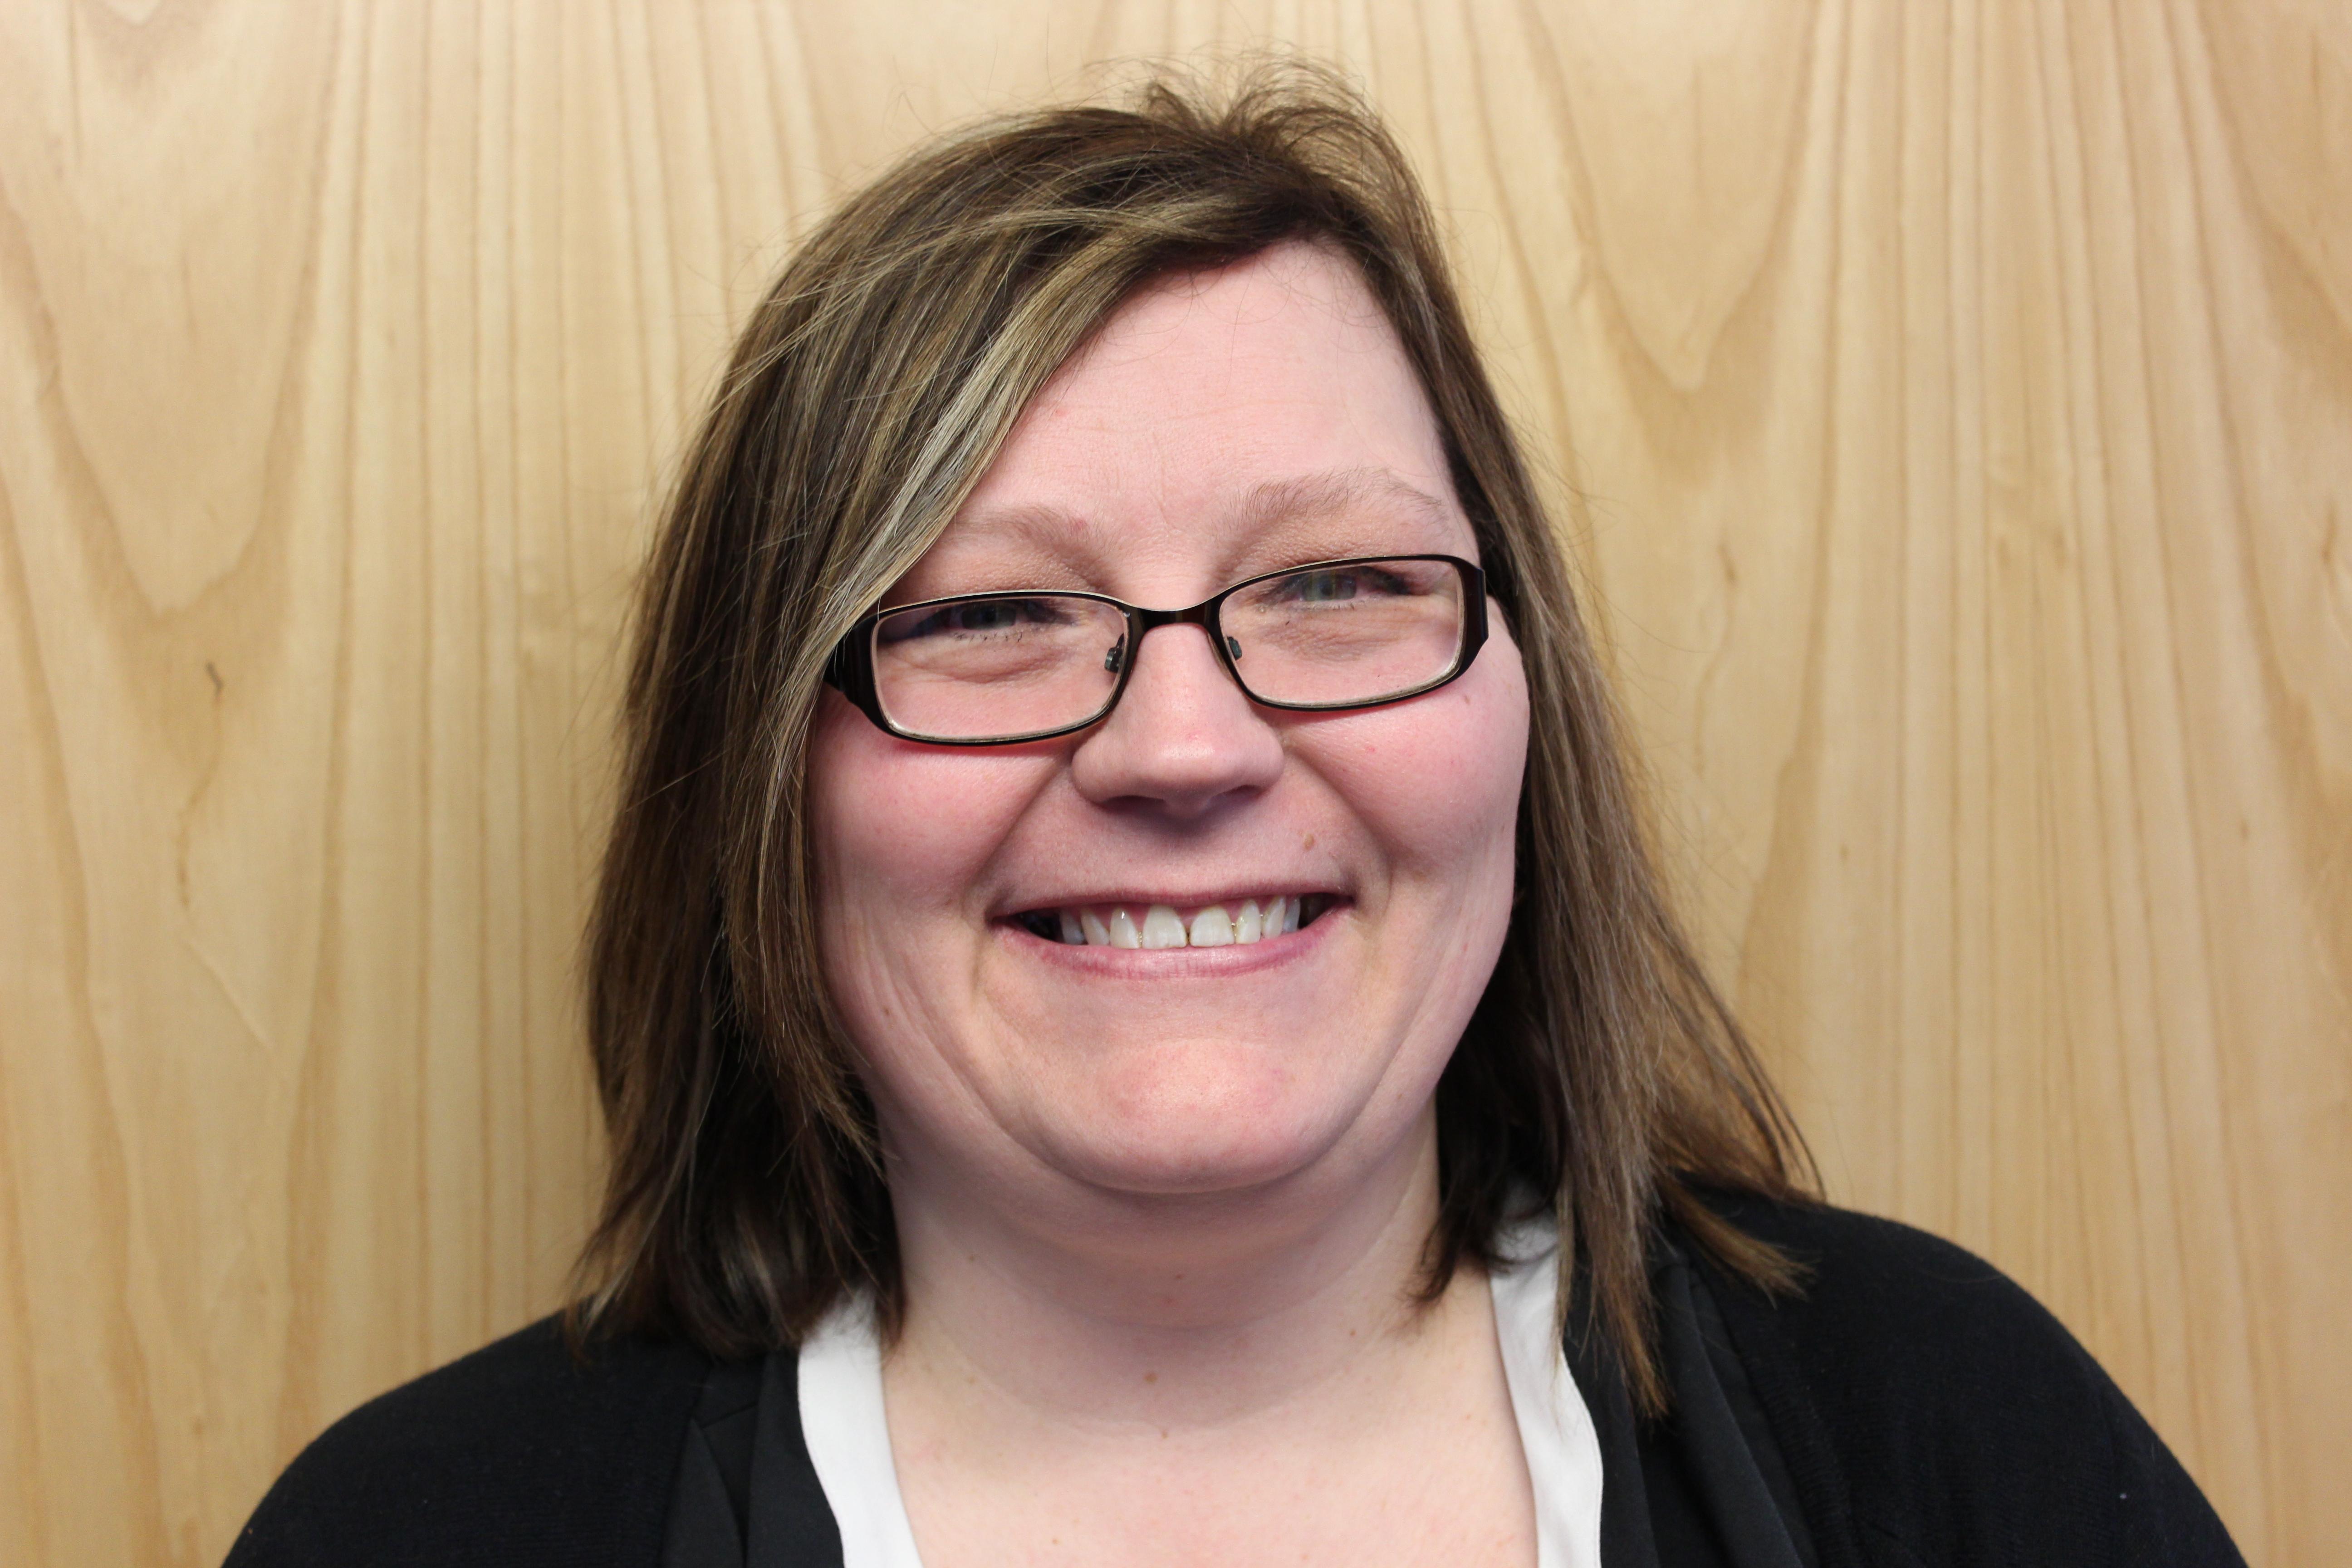 Kelly Baugh